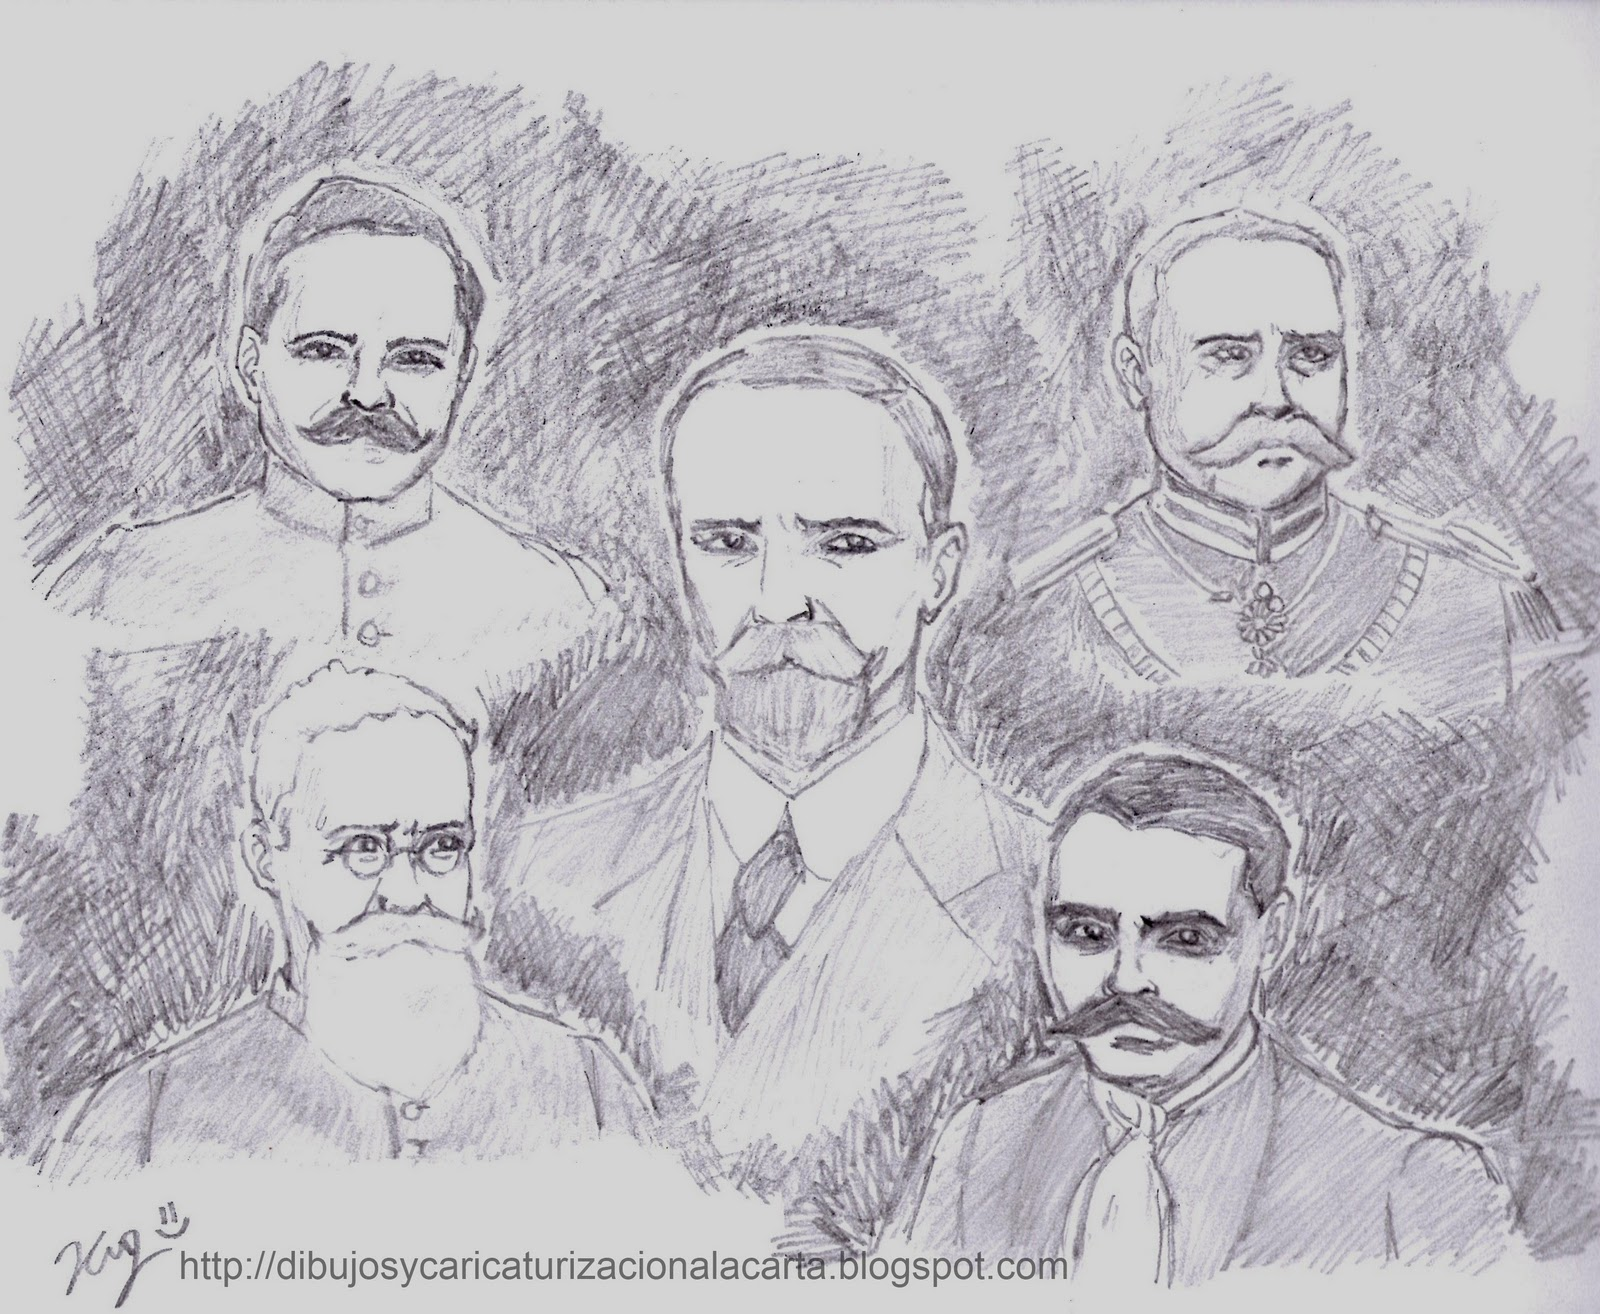 dibujos y caricaturizacion a la carta: La Revoluvion ...